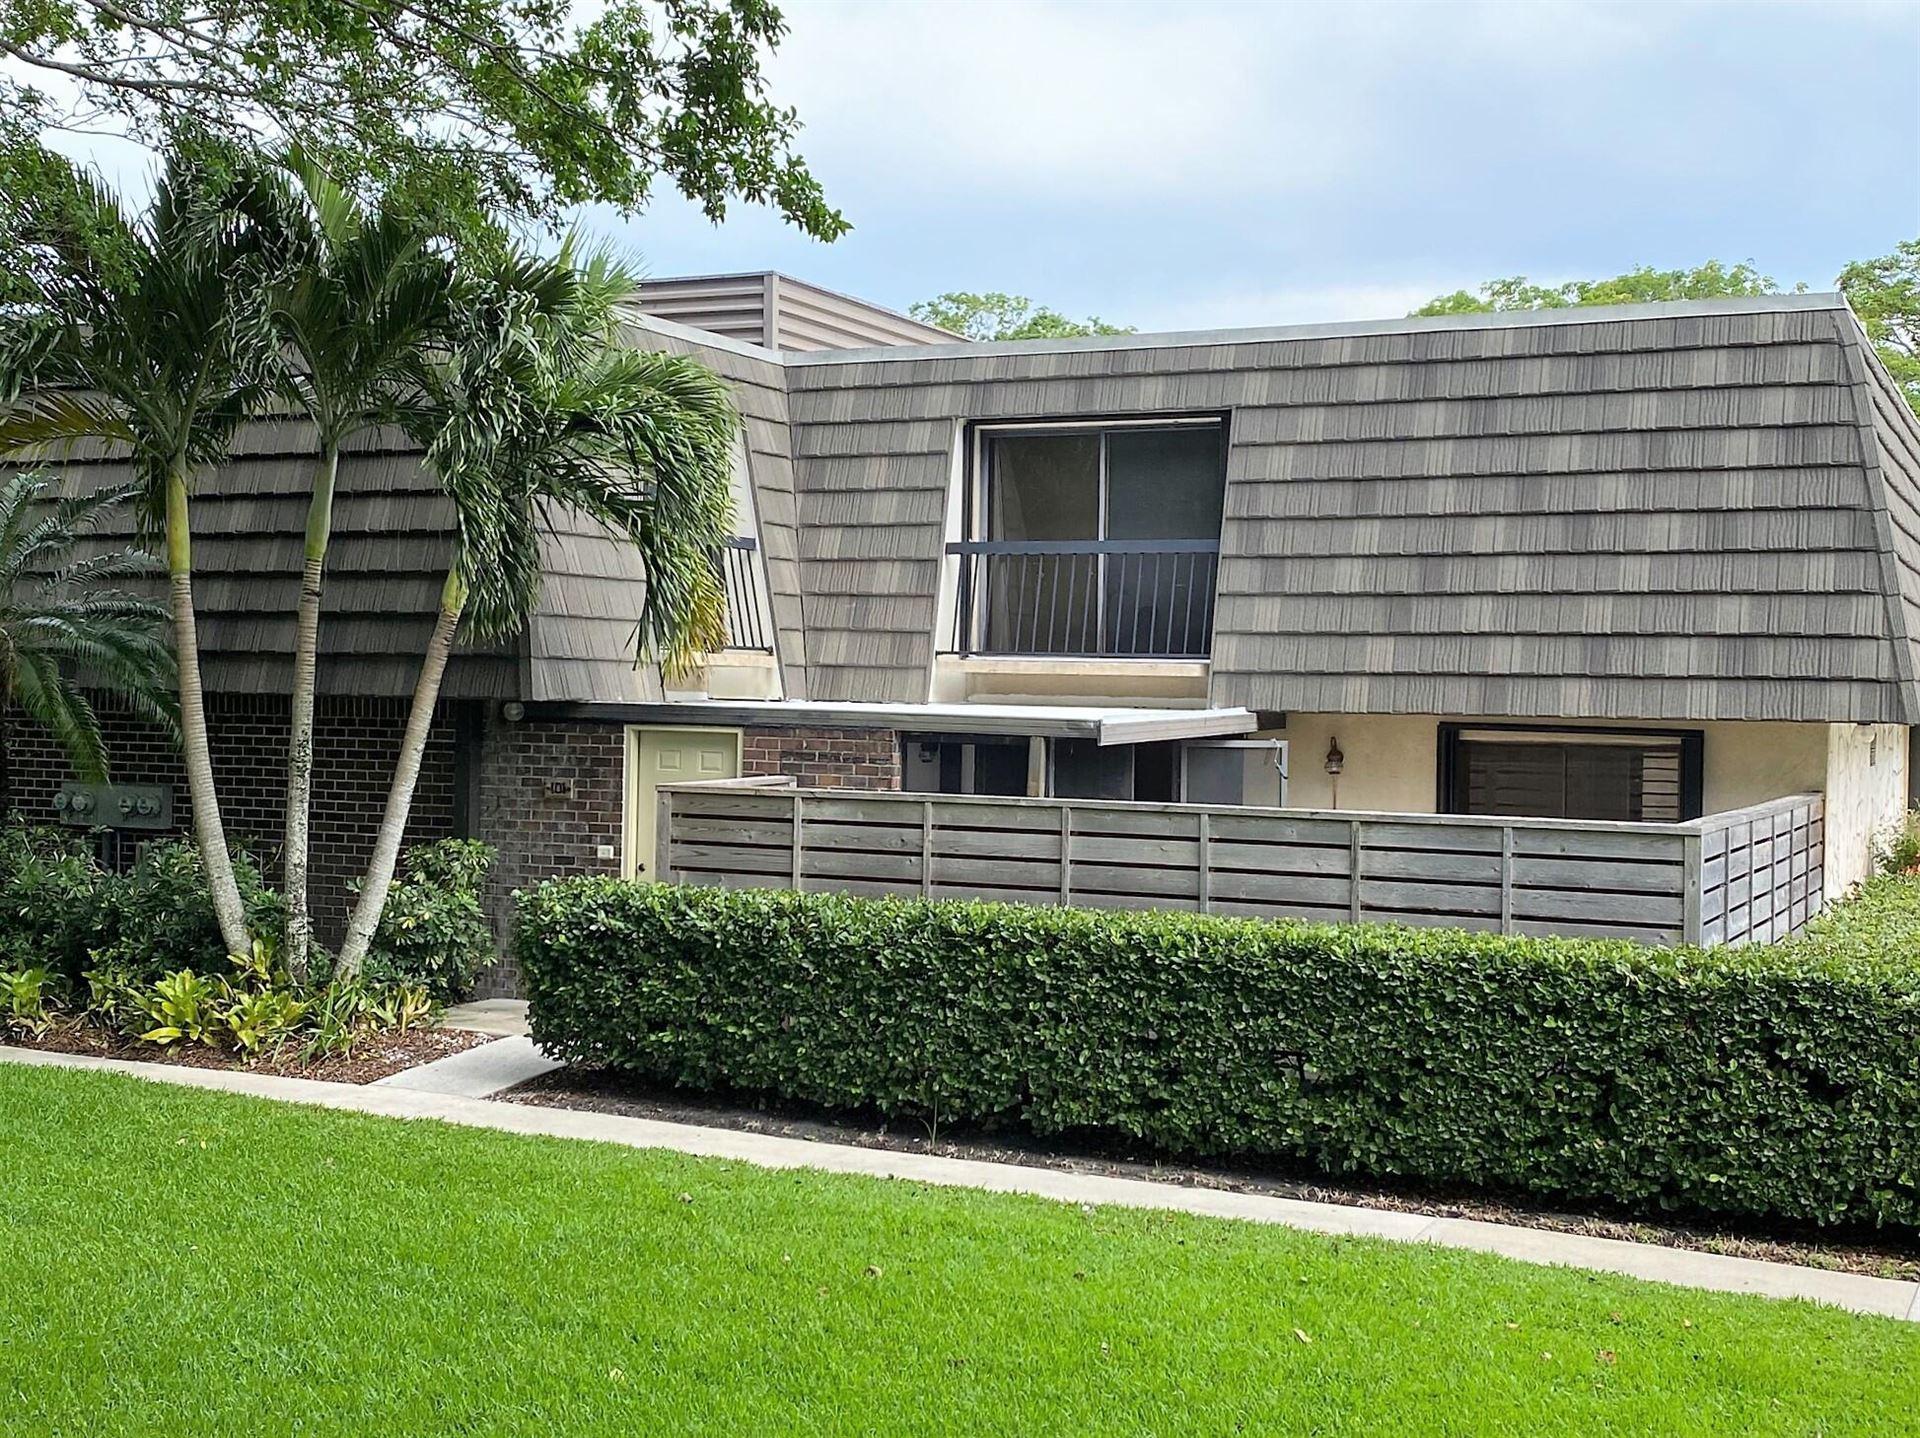 Photo of 101 1st Terrace, Palm Beach Gardens, FL 33418 (MLS # RX-10716506)